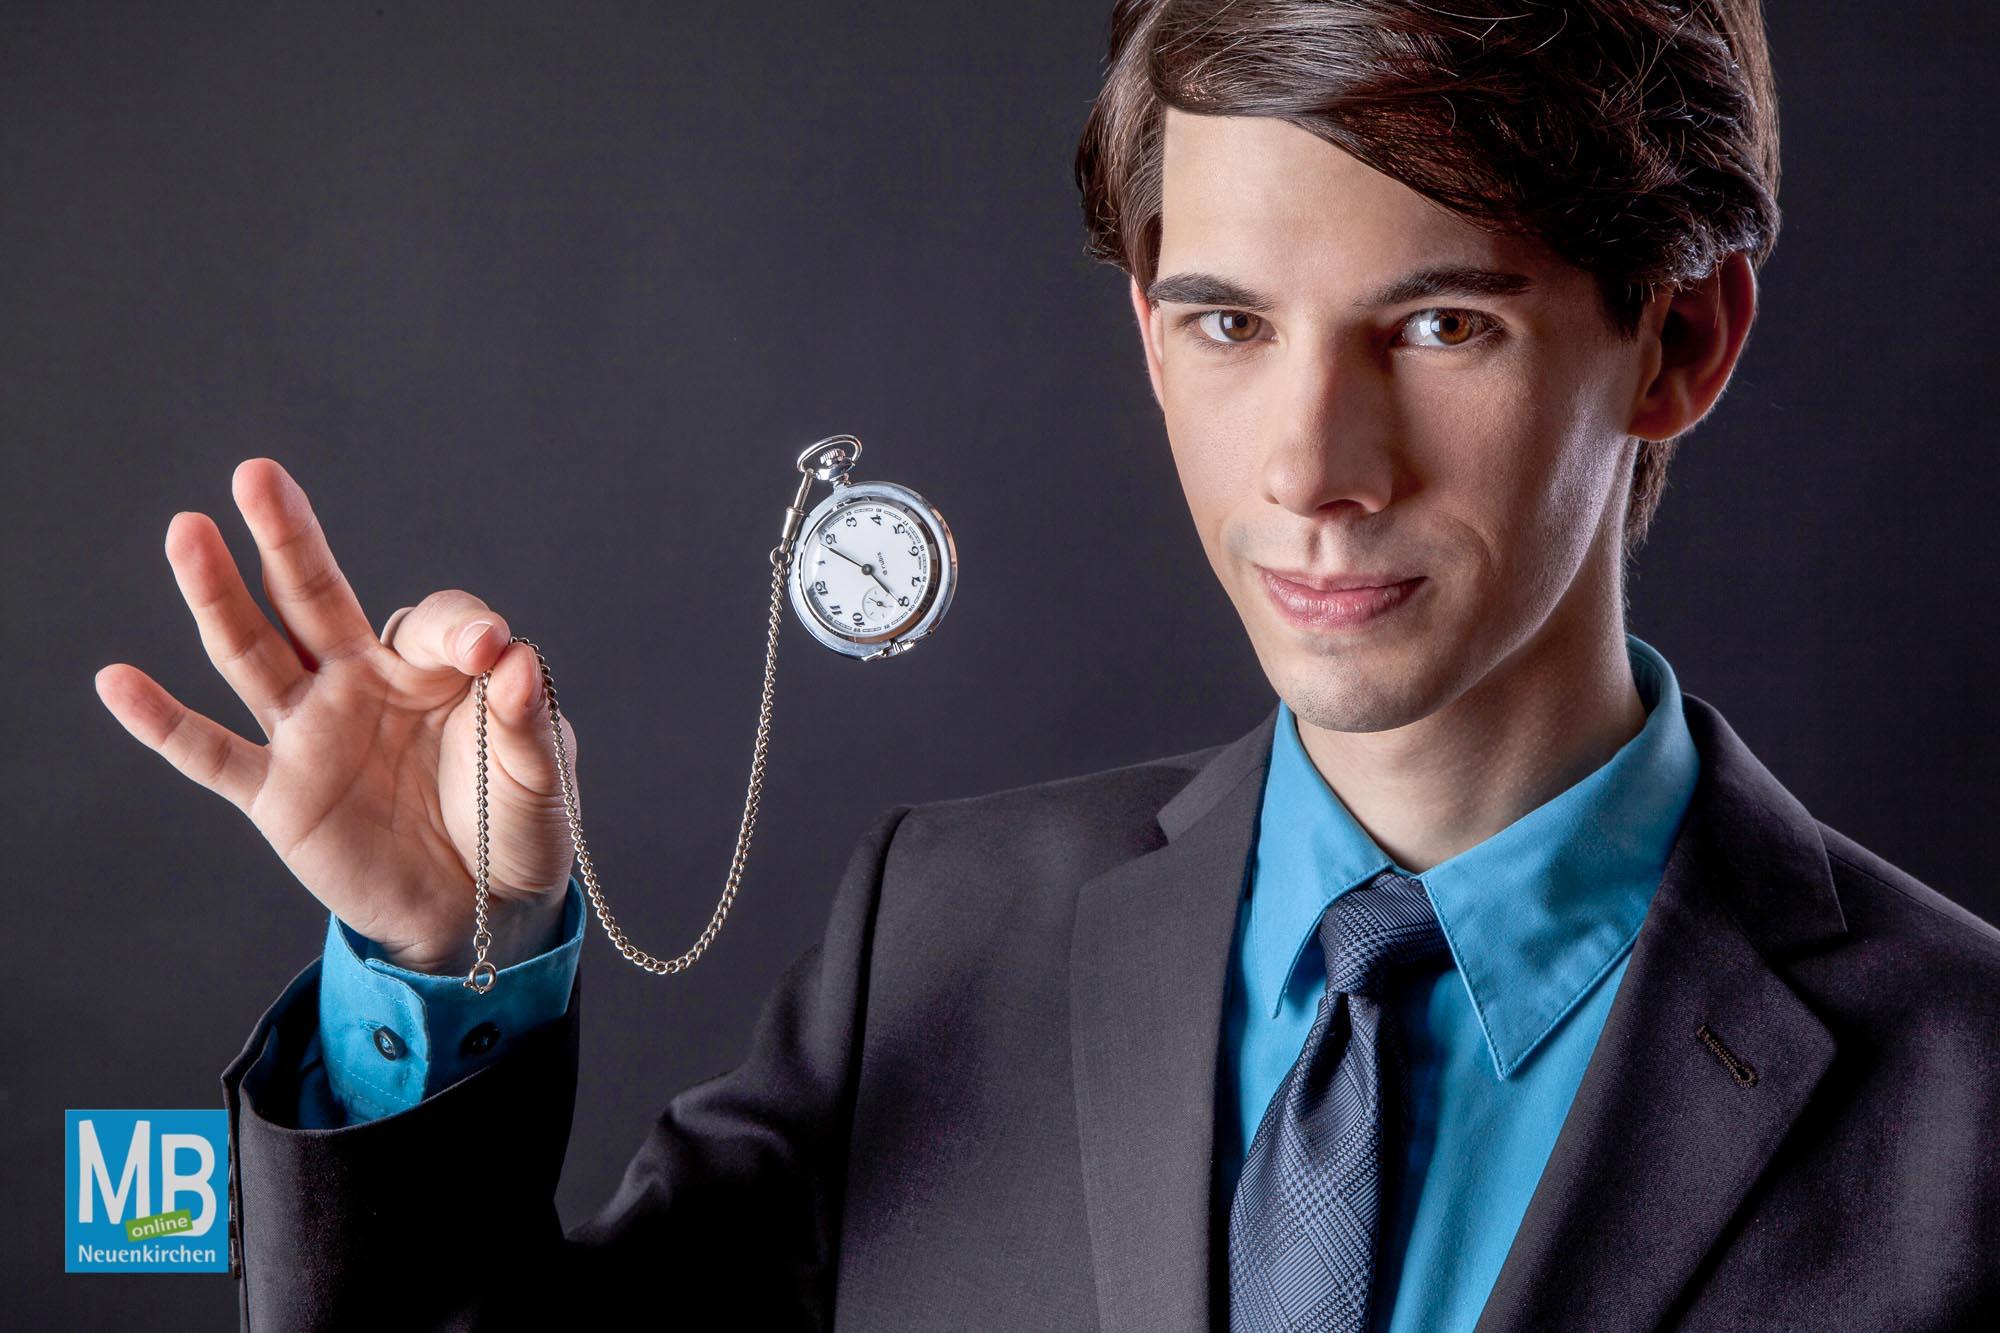 Zauberkünstler Alexander Merk kommt nach Neuenkirchen ...